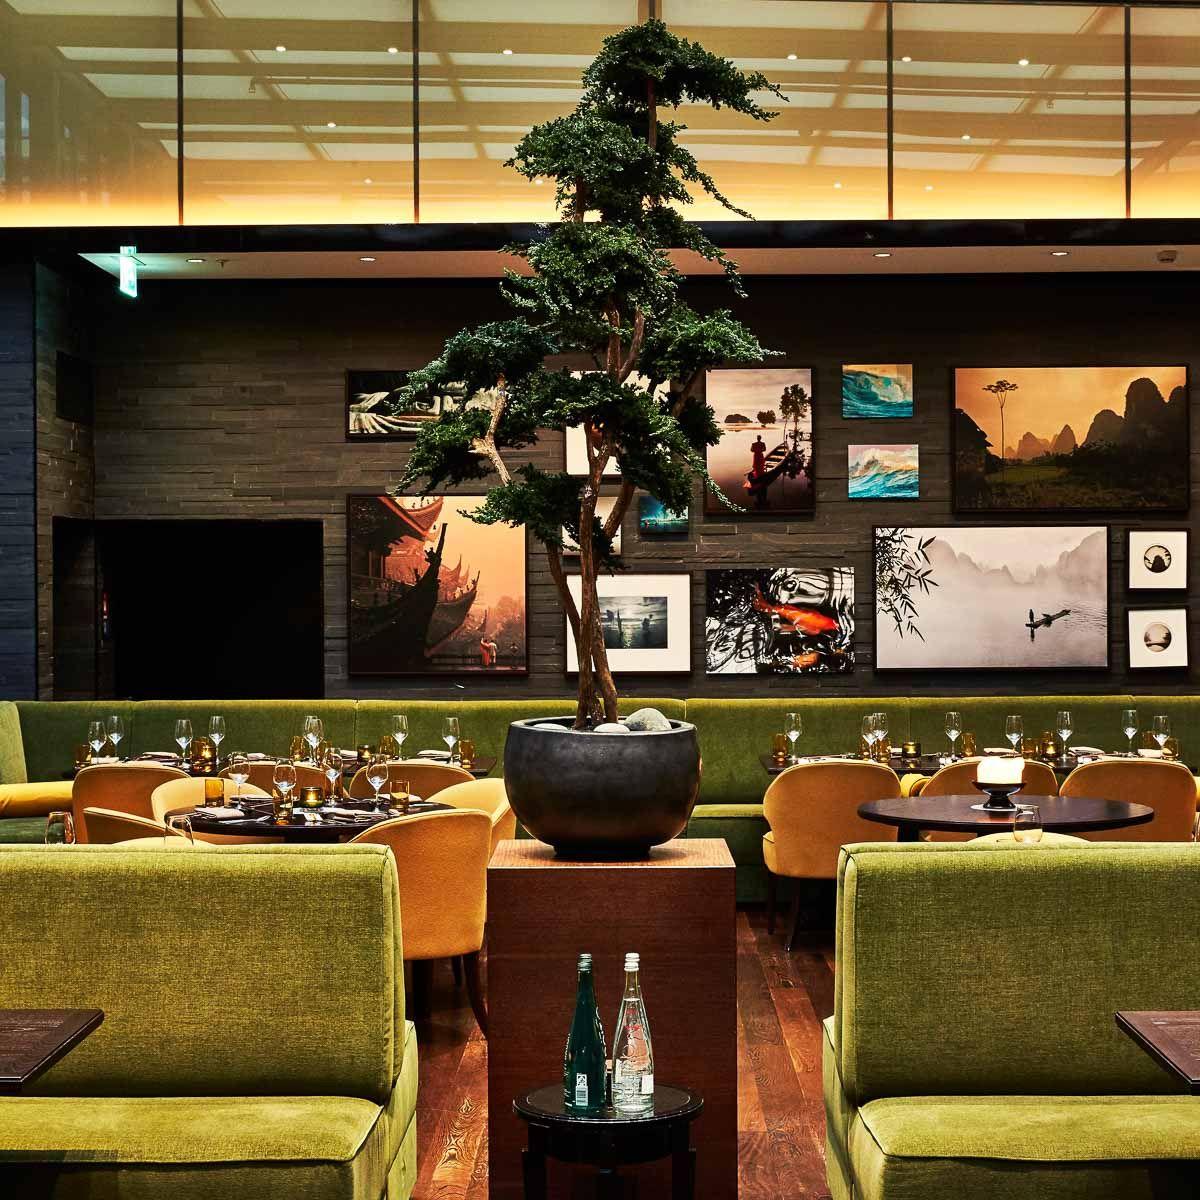 Restaurant Sra Bua Im Hotel Adlon Berlin Creme Guides Restaurant Restaurant Bar Lounge Musik